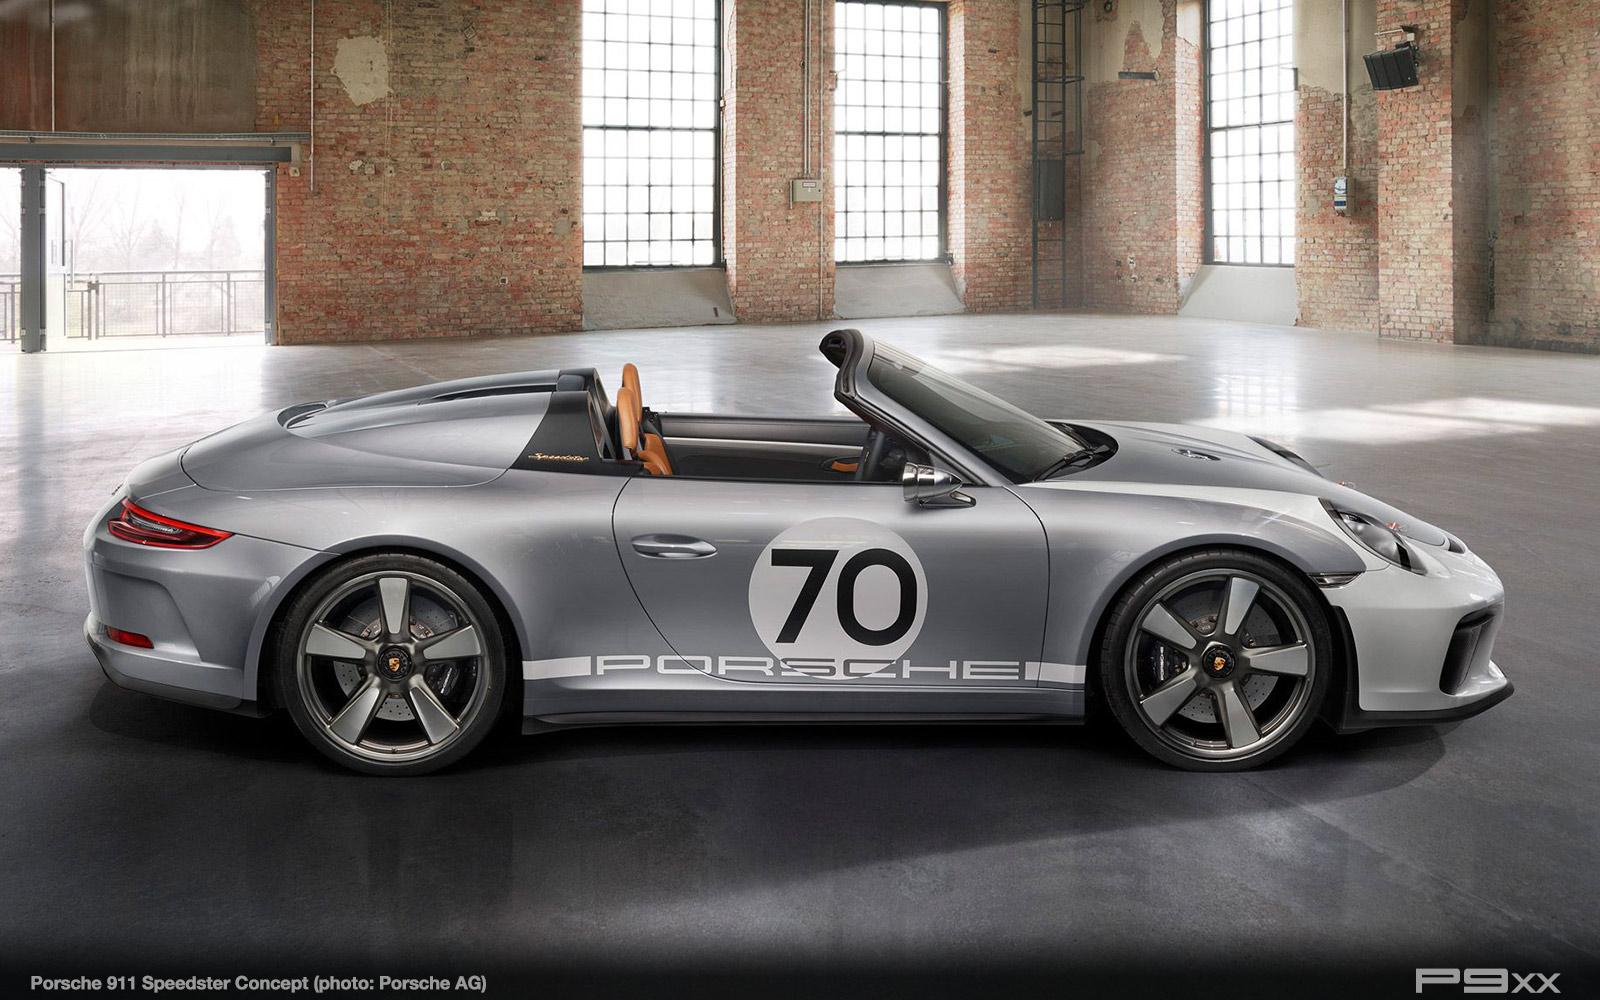 Porsche-911-Speedster-Concept-2018-295